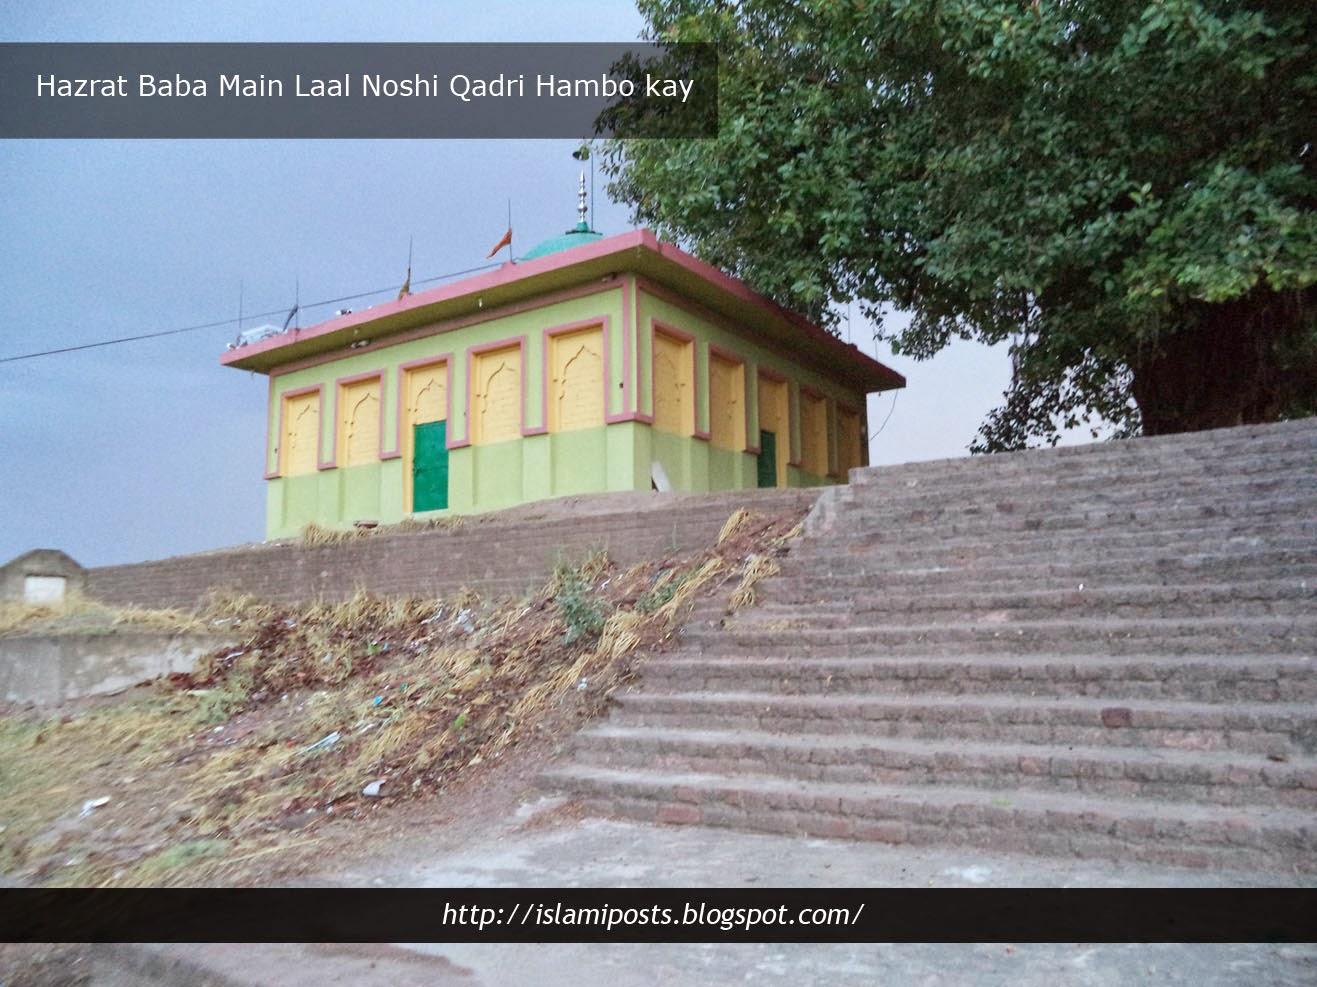 Hazrat Baba Laal Noshi Qadri of Sambrial-Sialkot